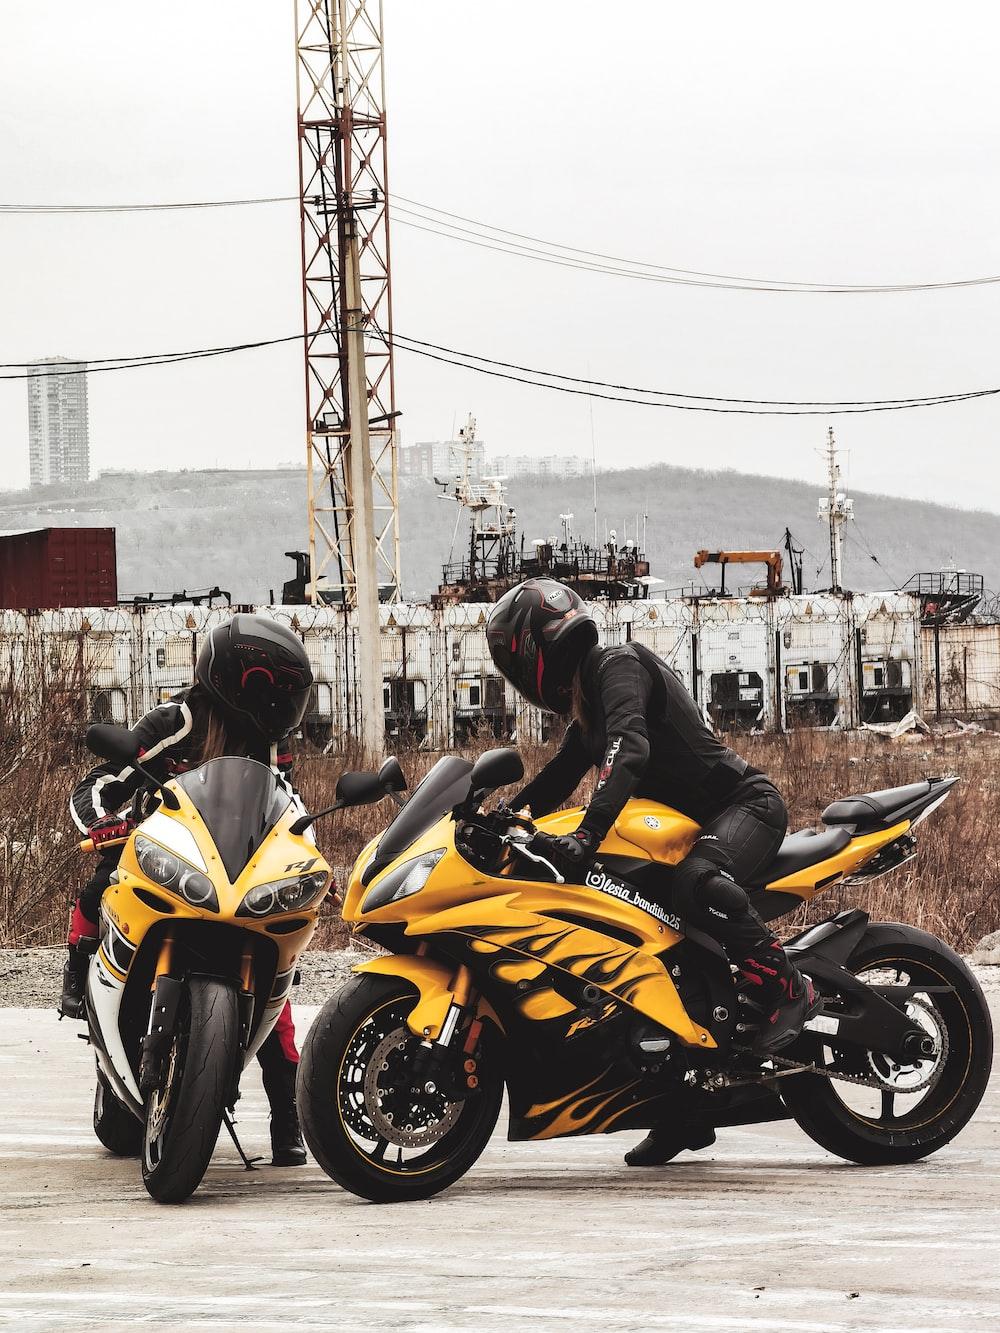 man in black helmet riding yellow sports bike during daytime